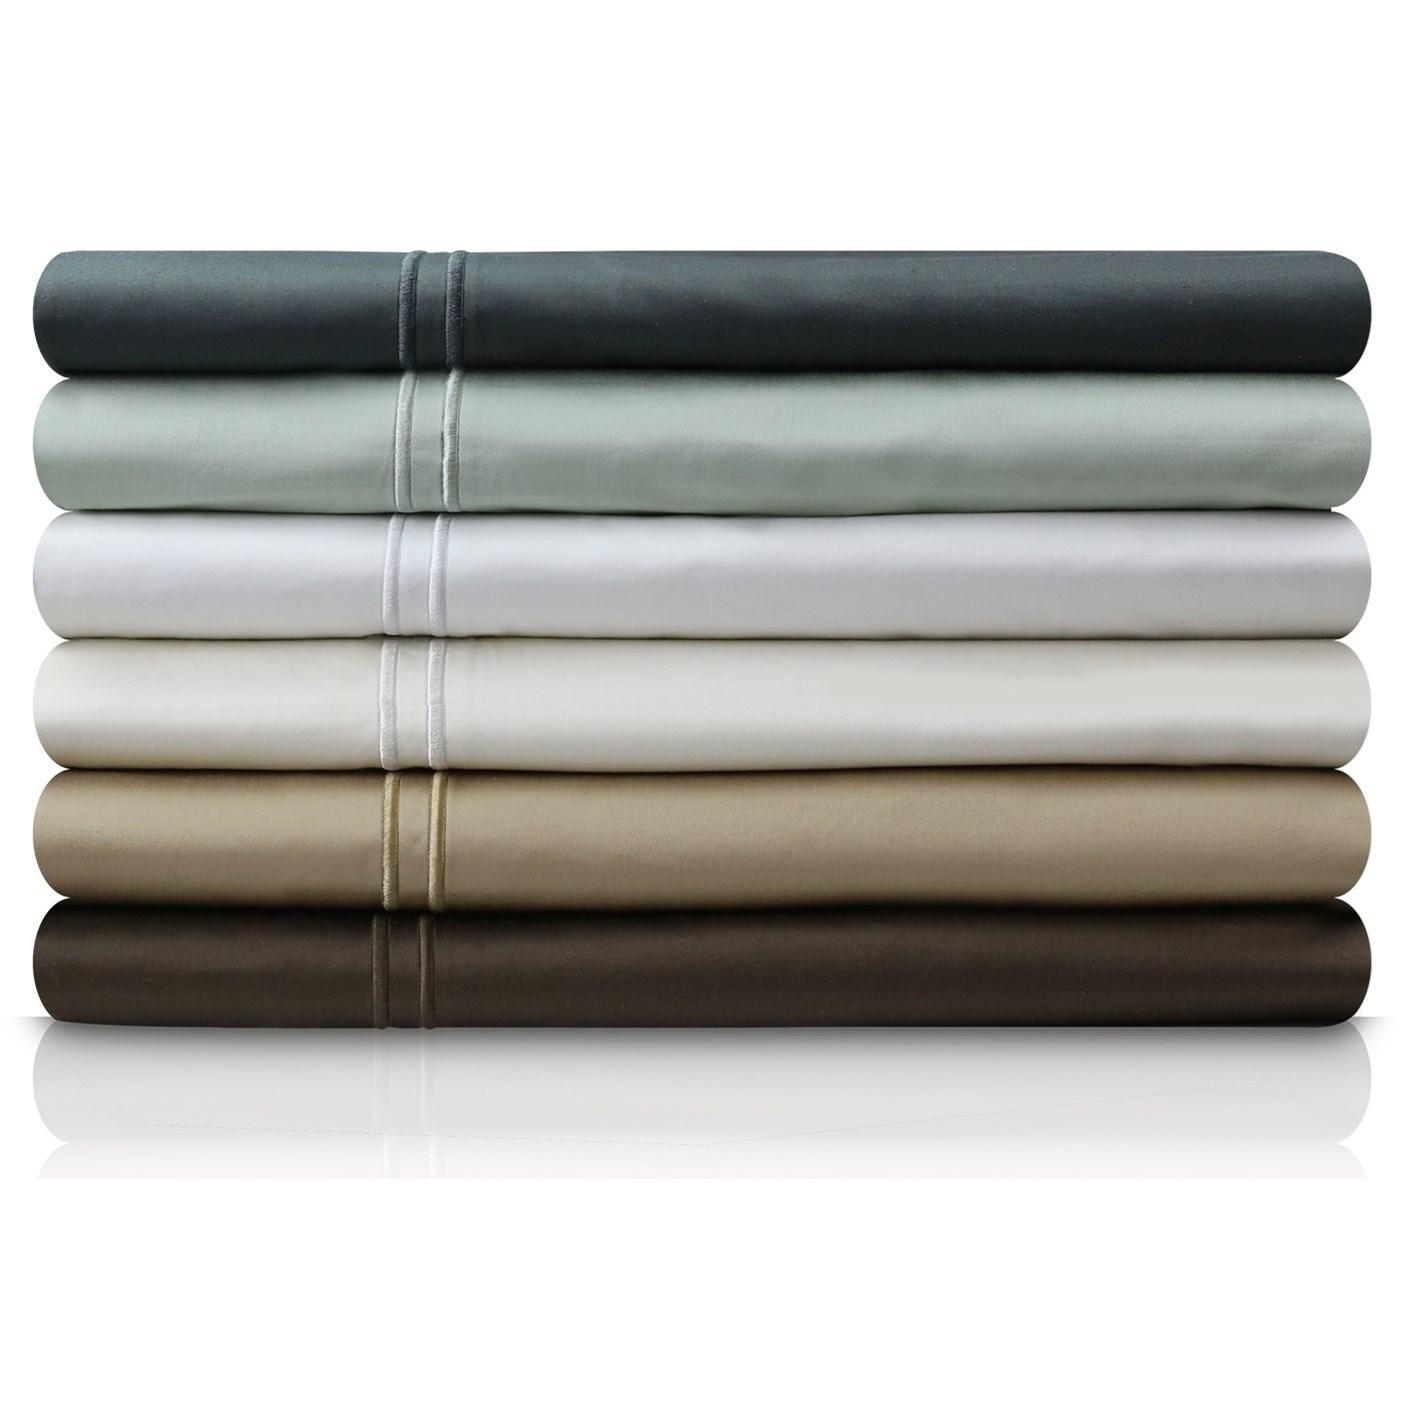 Malouf Egyptian Cotton King 600 TC Egyptian Cotton Pillowcases  - Item Number: MA06KKSLPC